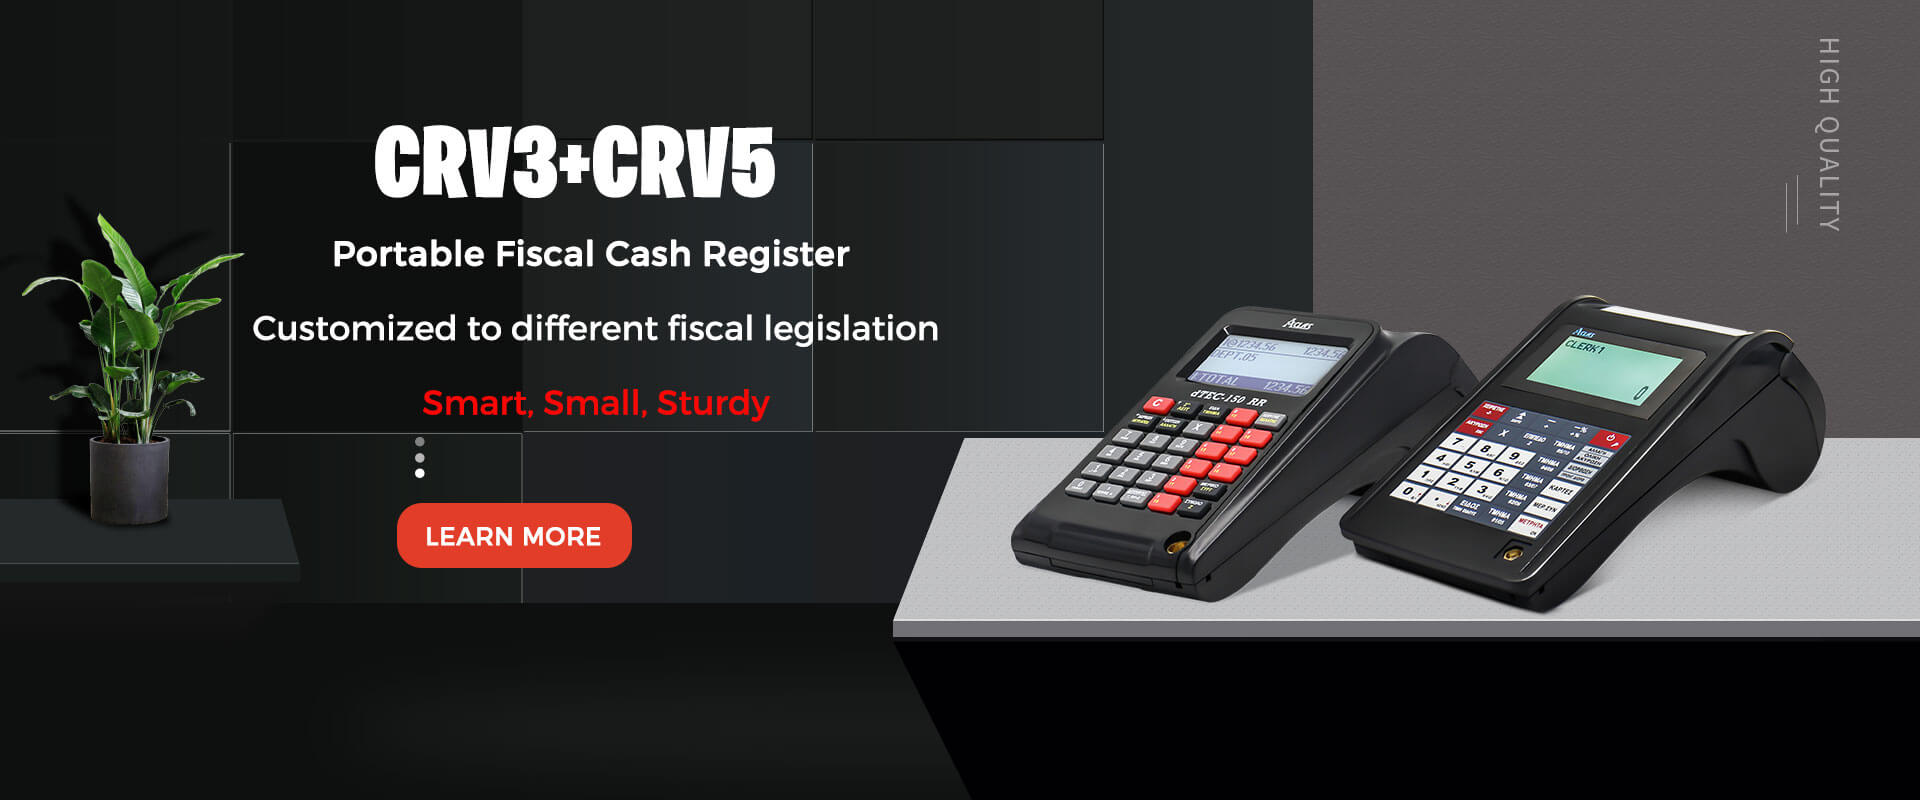 CRV3-CRV5